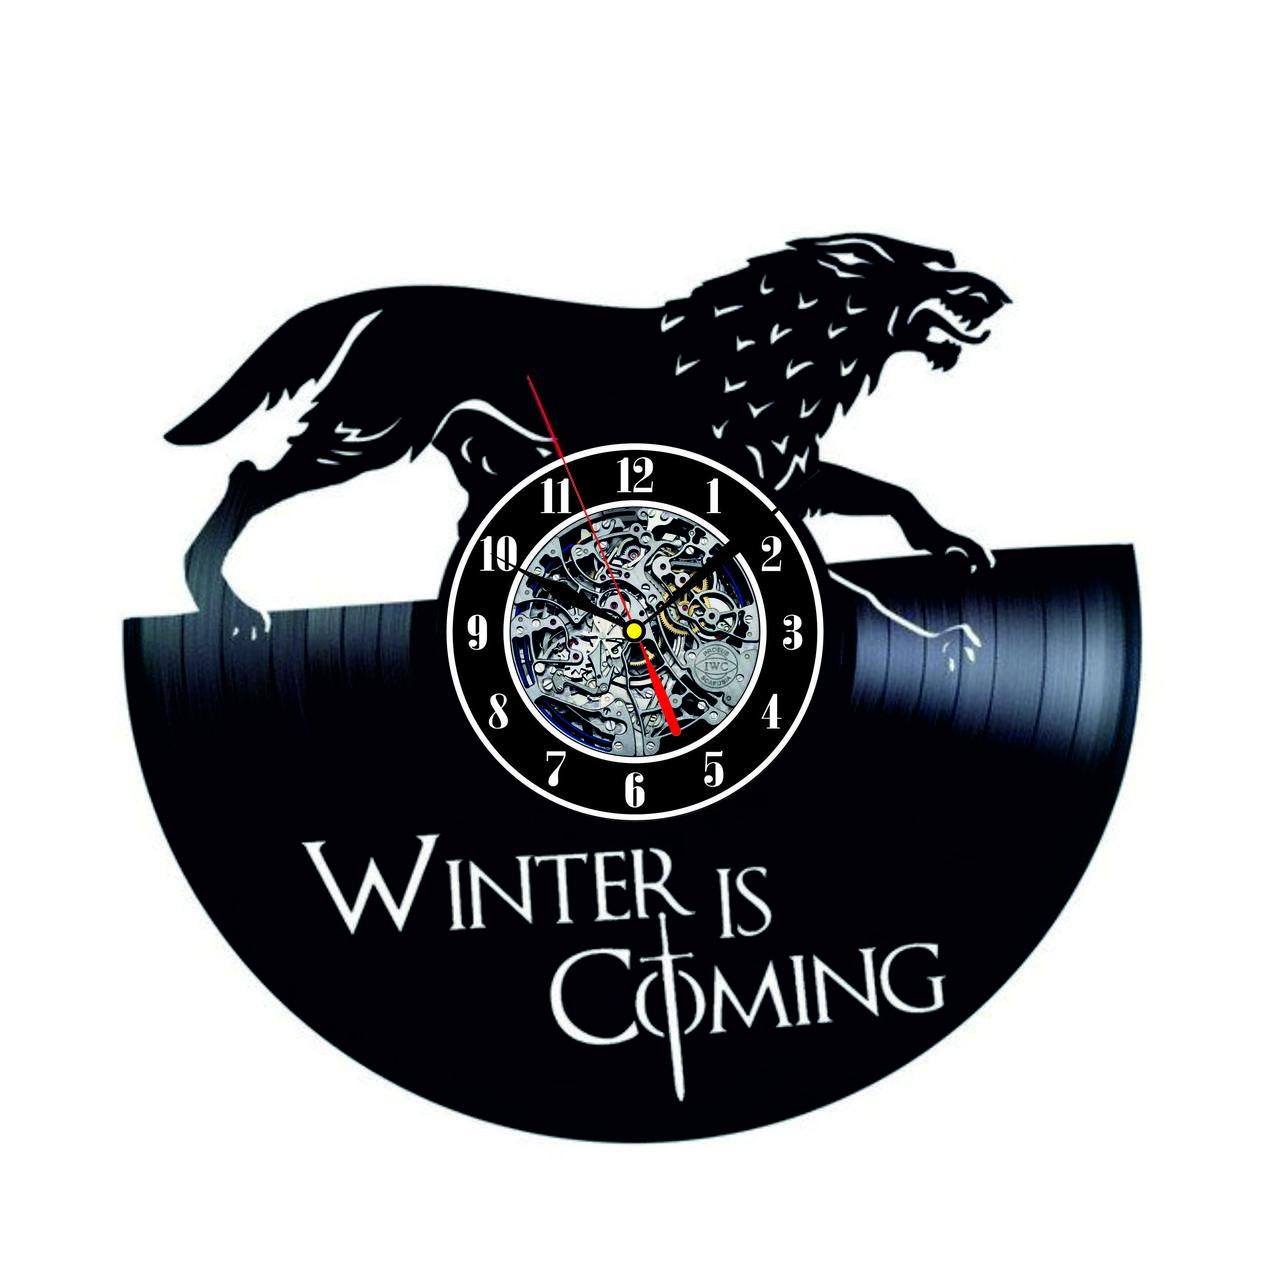 Настенные часы из виниловых пластинок LikeMark Game of Thrones